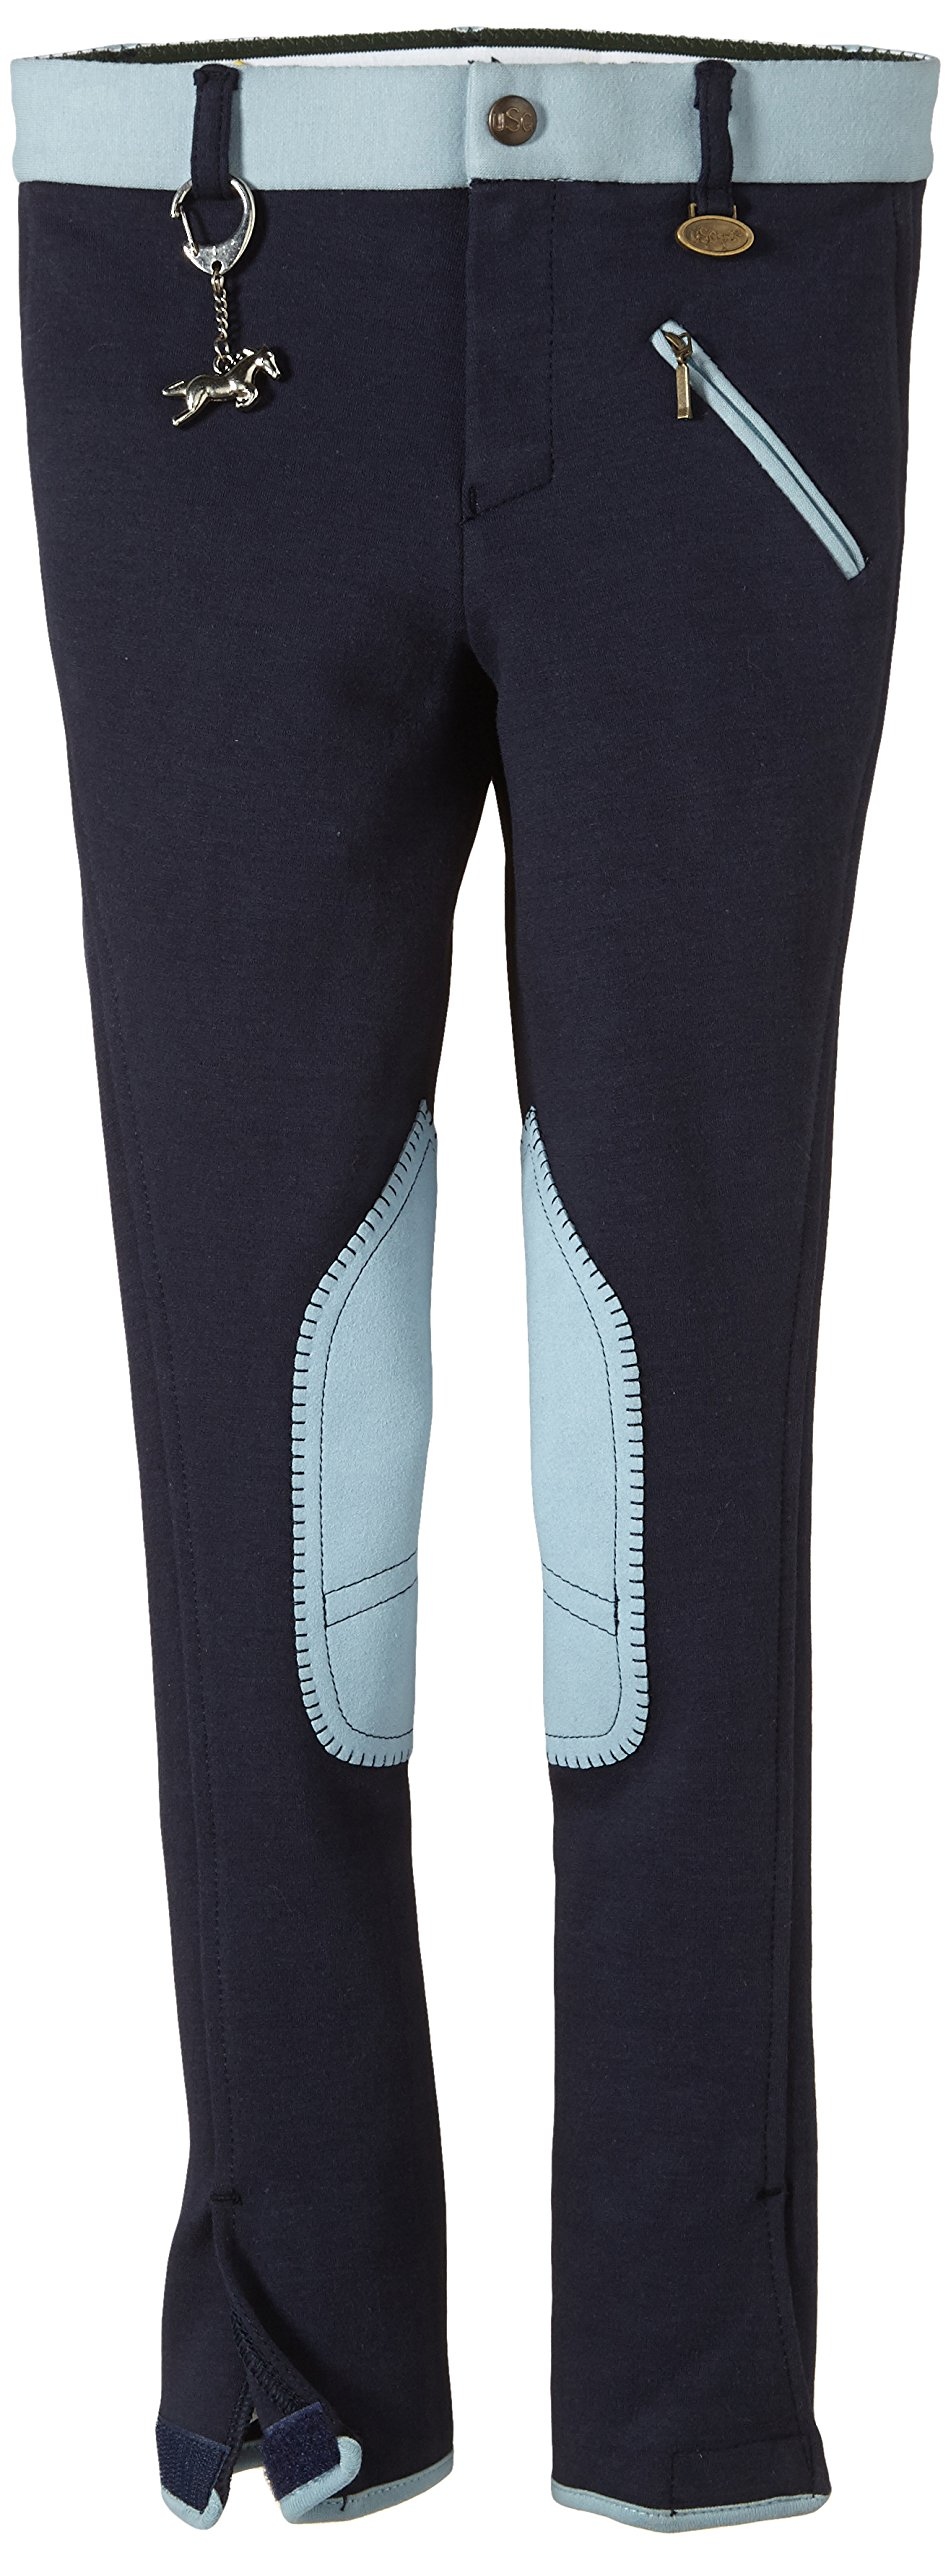 USG United Sportproducts, Pantaloni da cavallerizzo Bambino Emilia, Blu (Marine/Hell Blau), 152 cm